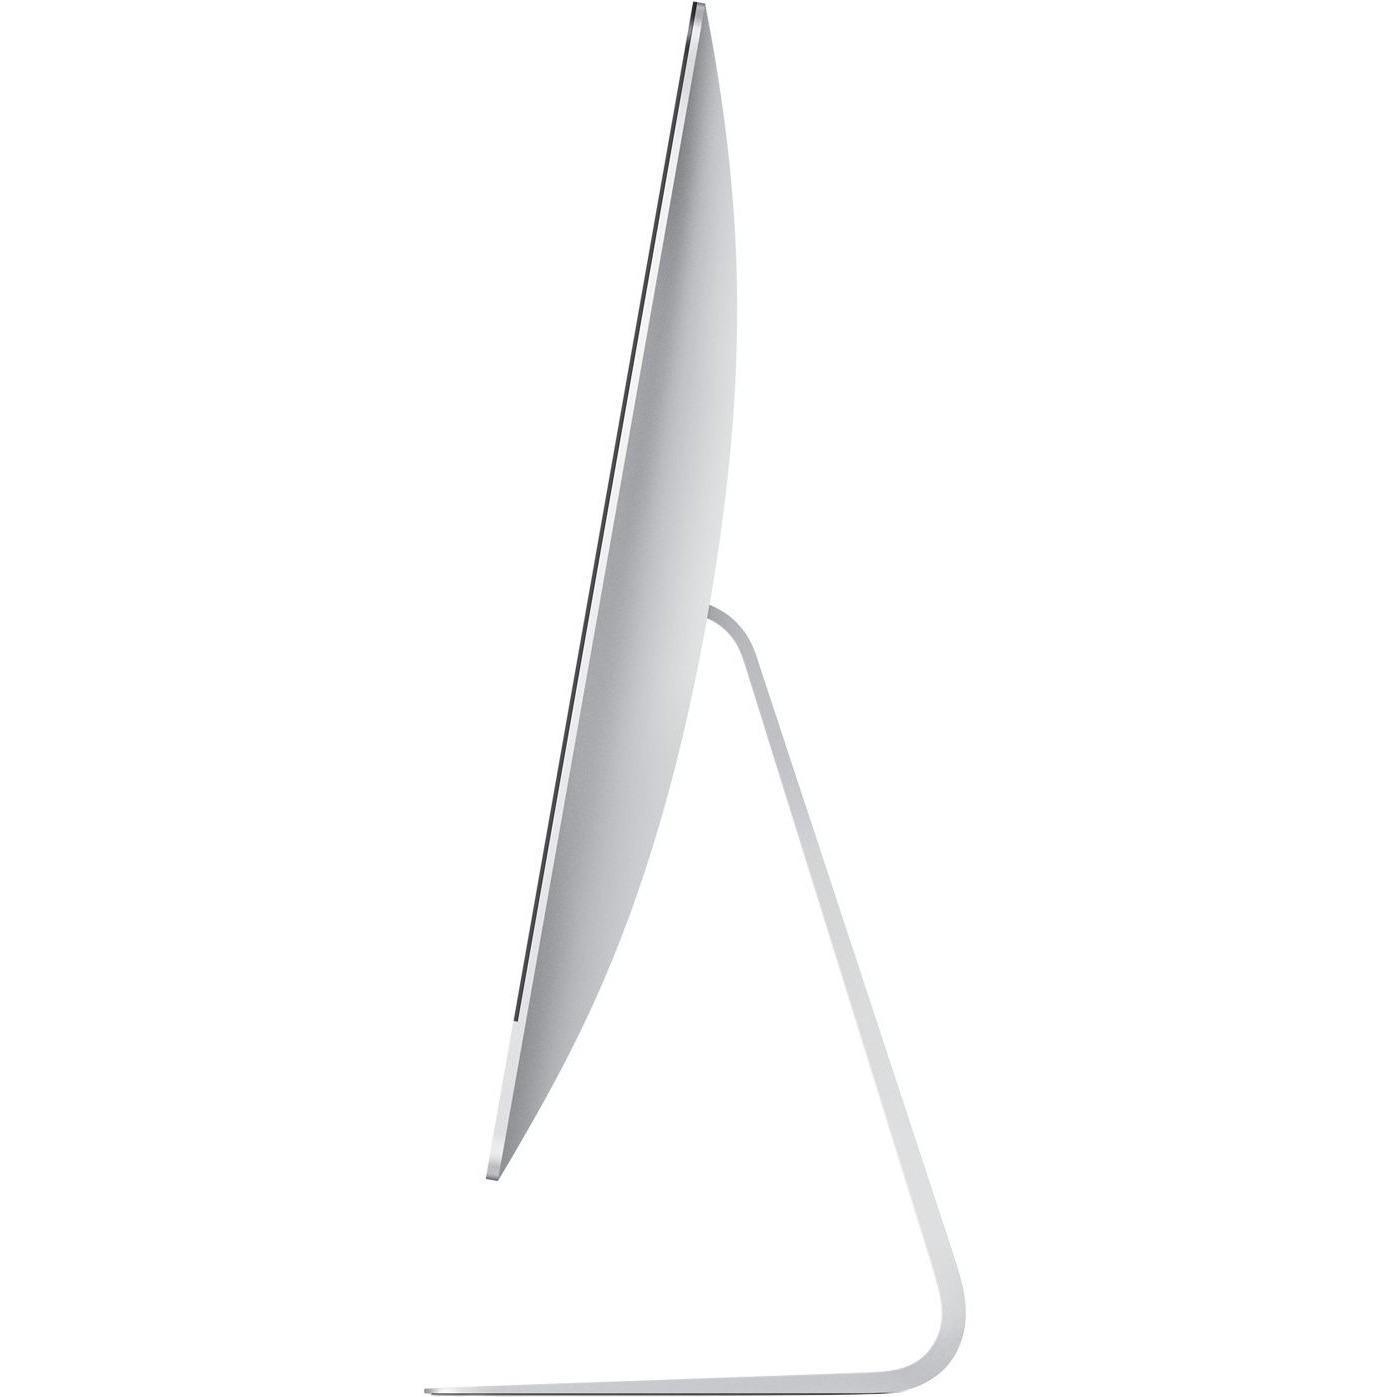 "iMac 27"" 5K (Ende 2015) Core i7 4 GHz - SSD 128 GB + HDD 2 TB - 16GB AZERTY - Französisch"